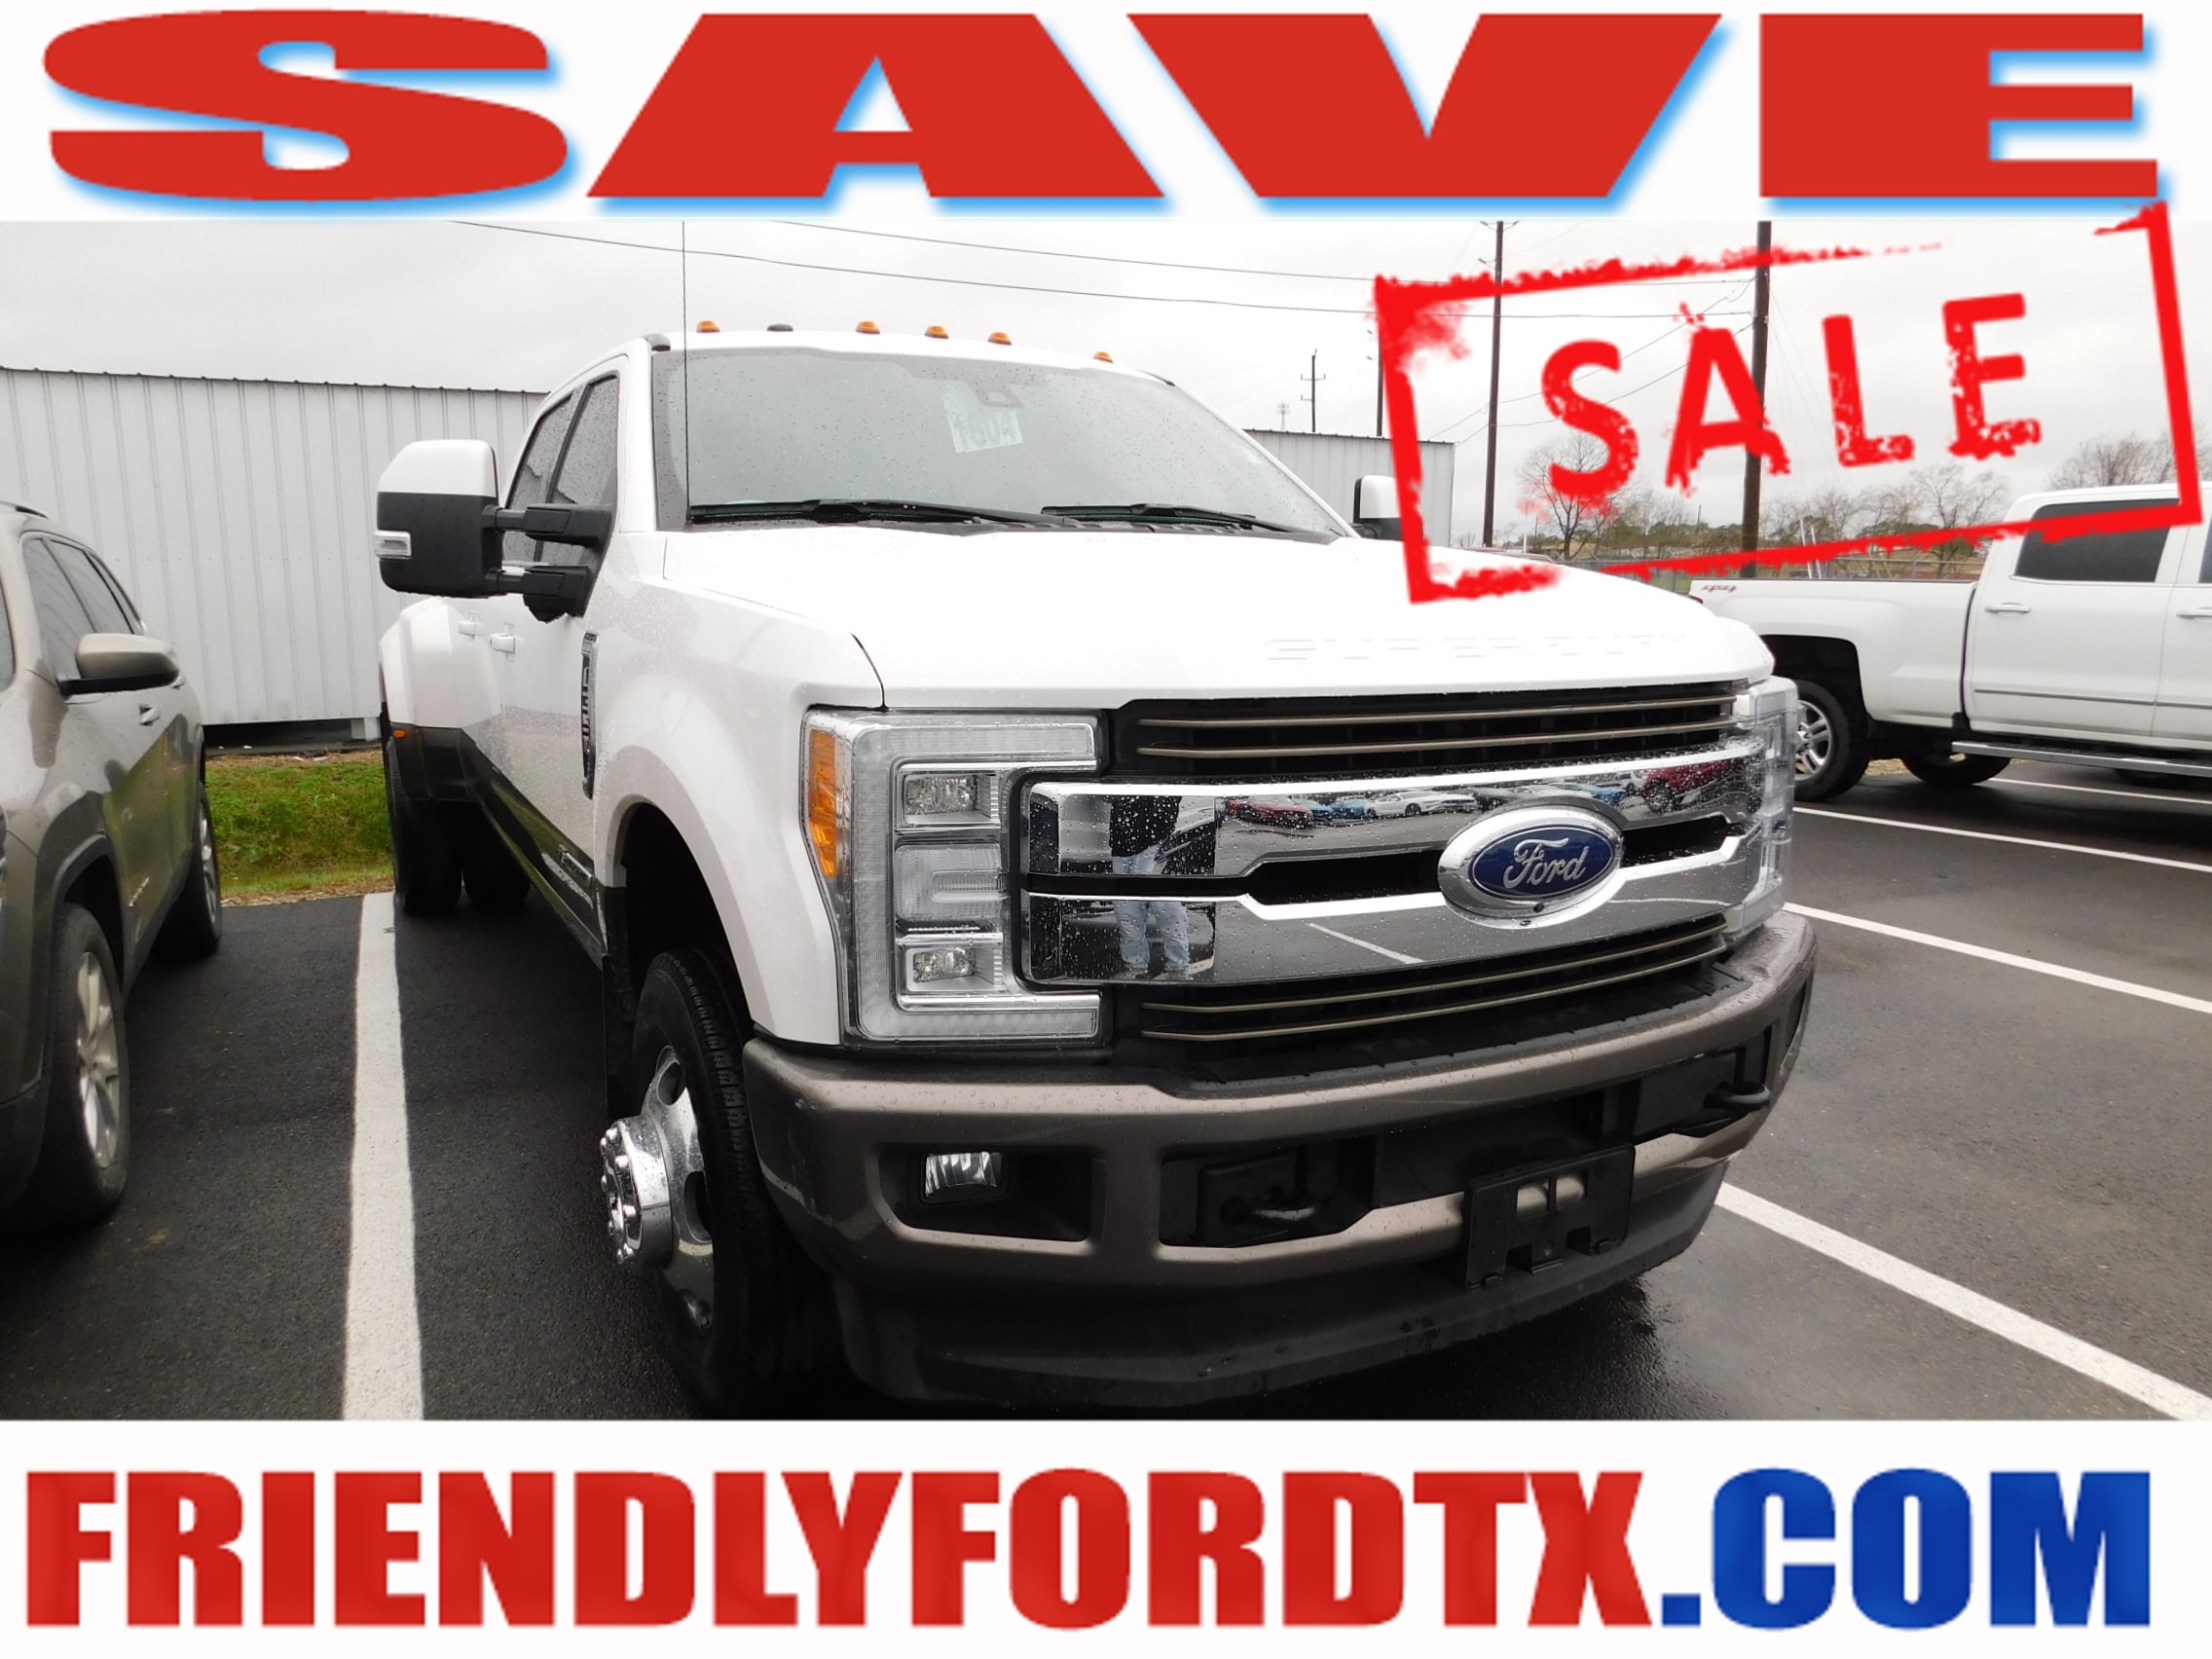 Photo Used 2018 Ford F-350SD King Ranch Truck Power Stroke V8 DI 32V OHV Turbodiesel for Sale in Crosby near Houston